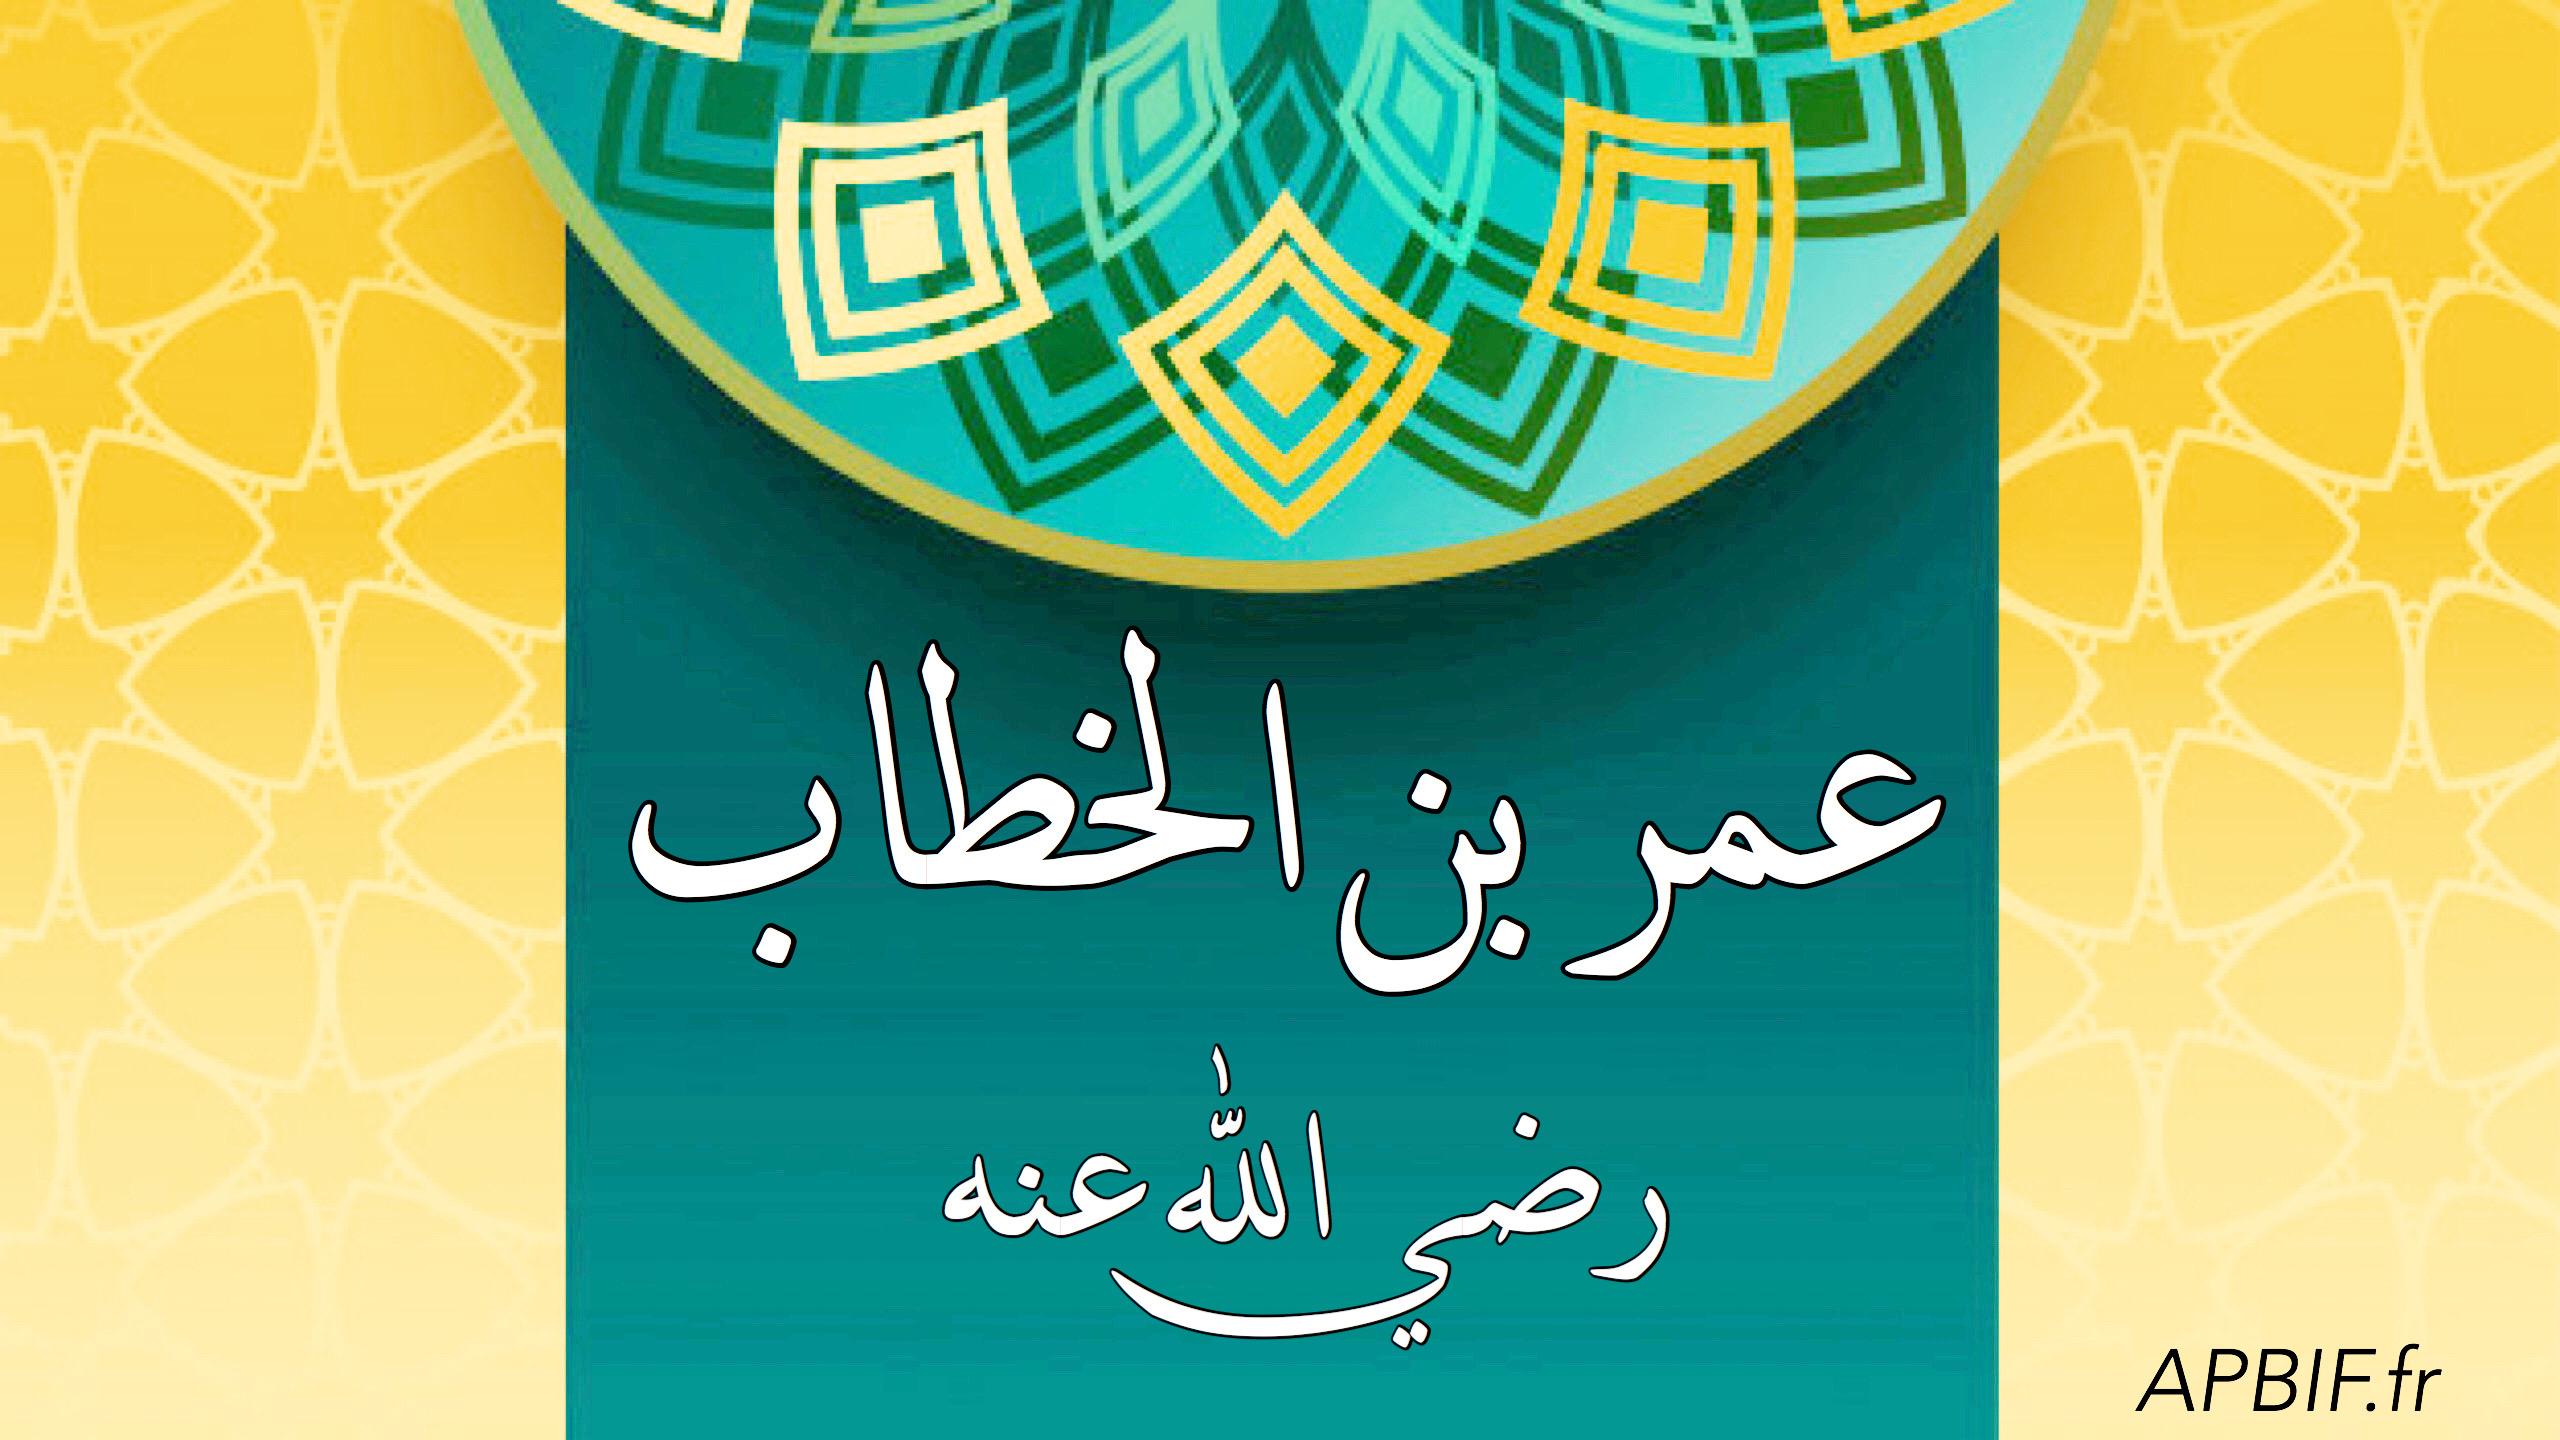 Omar ibn al-Khattab : Histoire d'un compagnon et deuxième calife